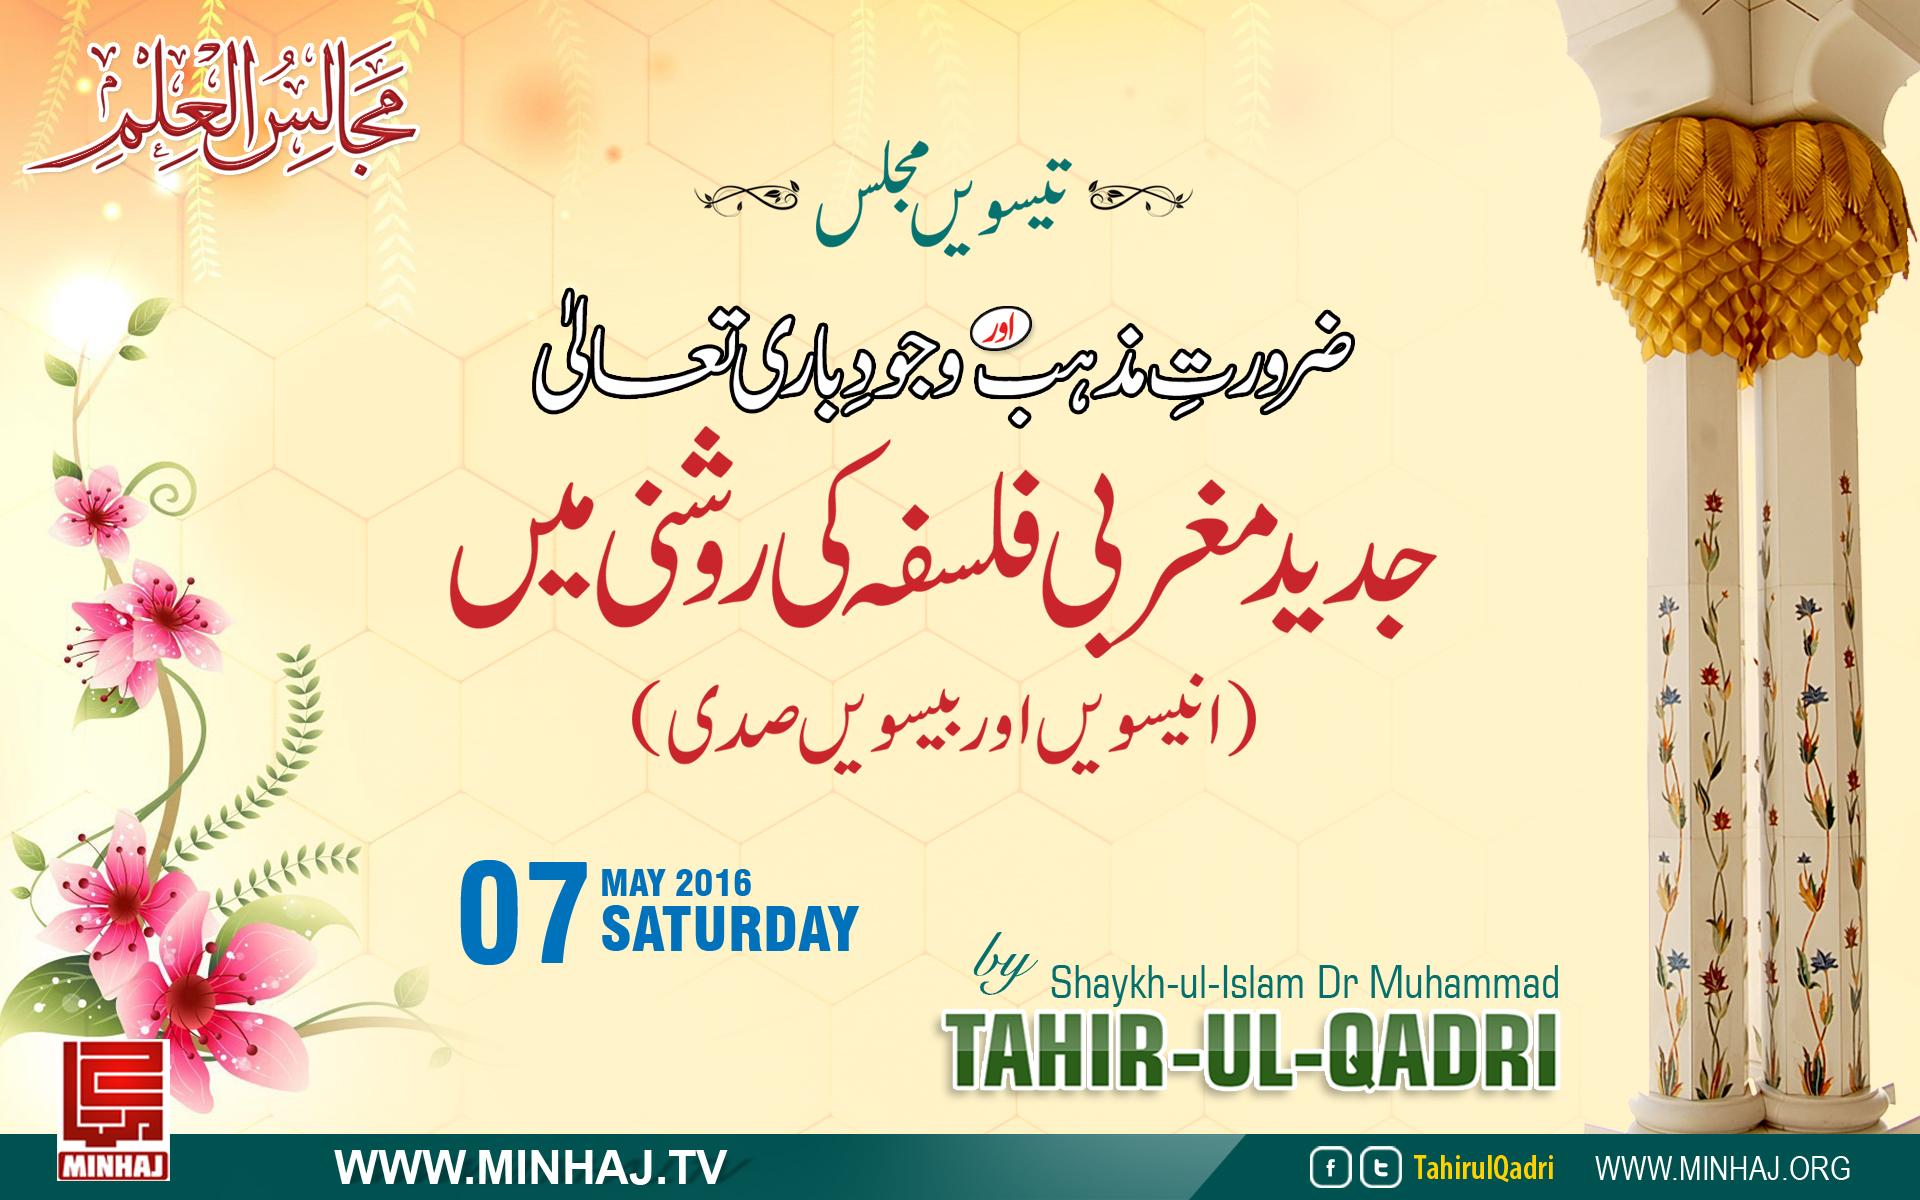 Majalis-ul-ilm (Lecture 30) - by Shaykh-ul-Islam Dr Muhammad Tahir-ul-Qadri